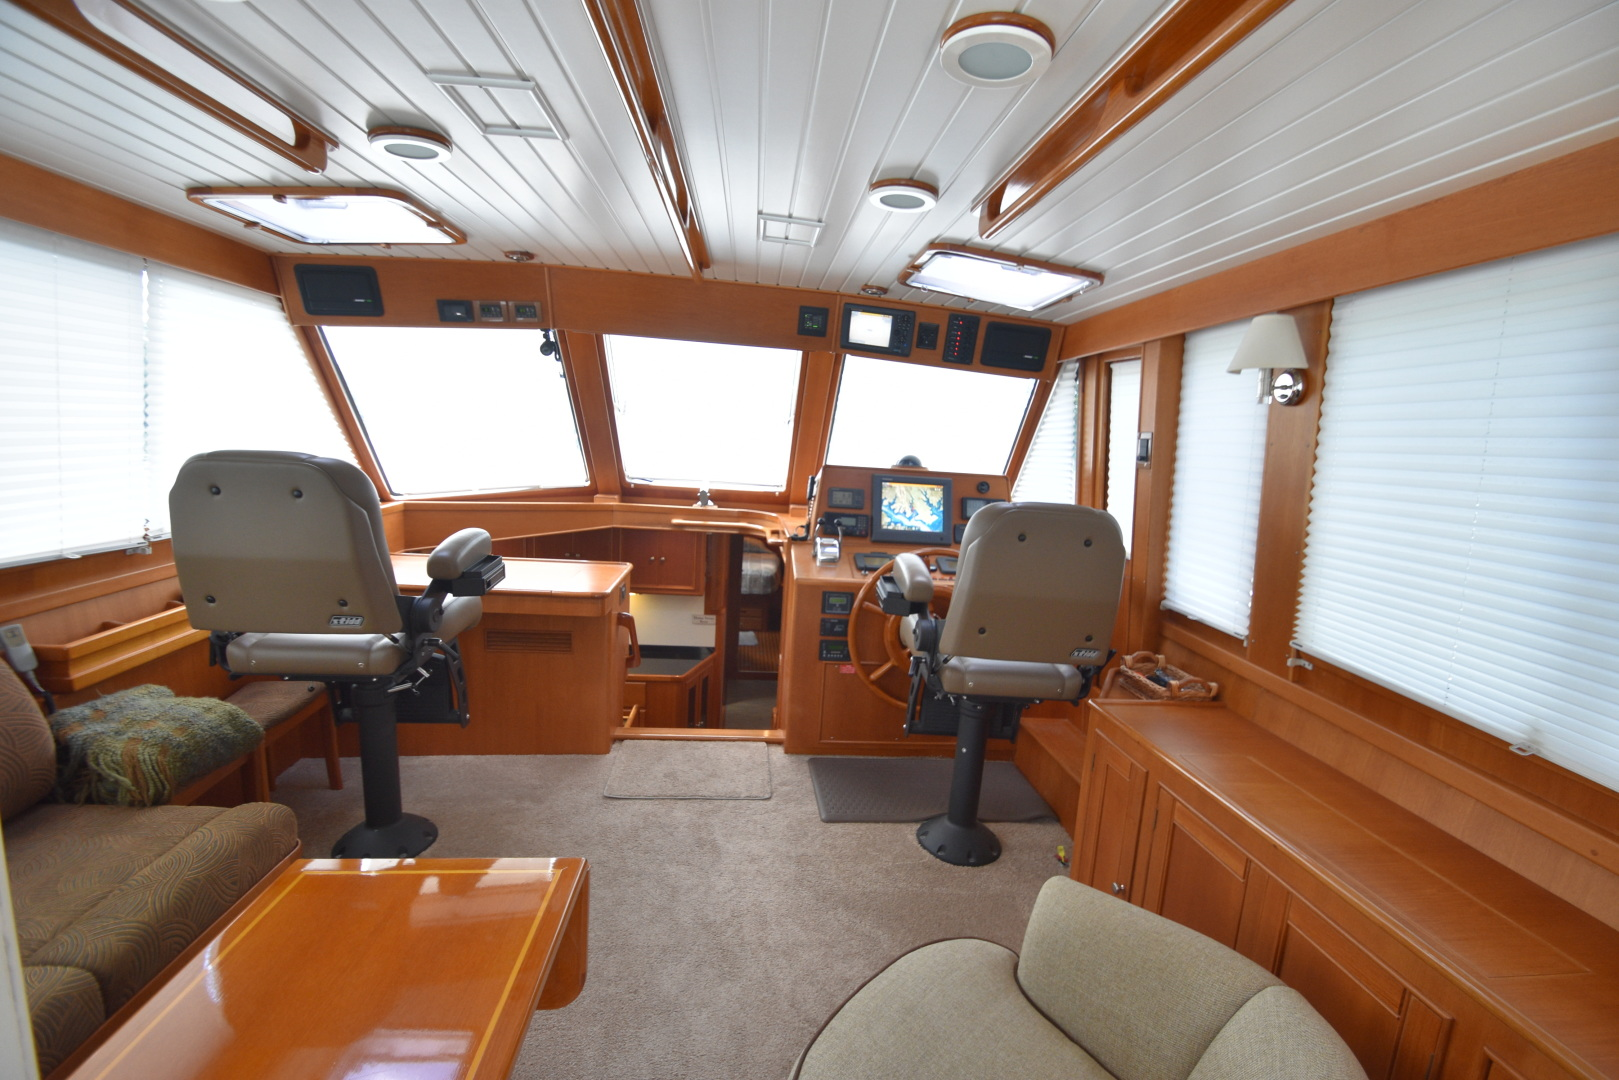 Grand Banks-49 Eastbay SX 2005-Arietta Annapolis-Maryland-United States-1456227   Thumbnail